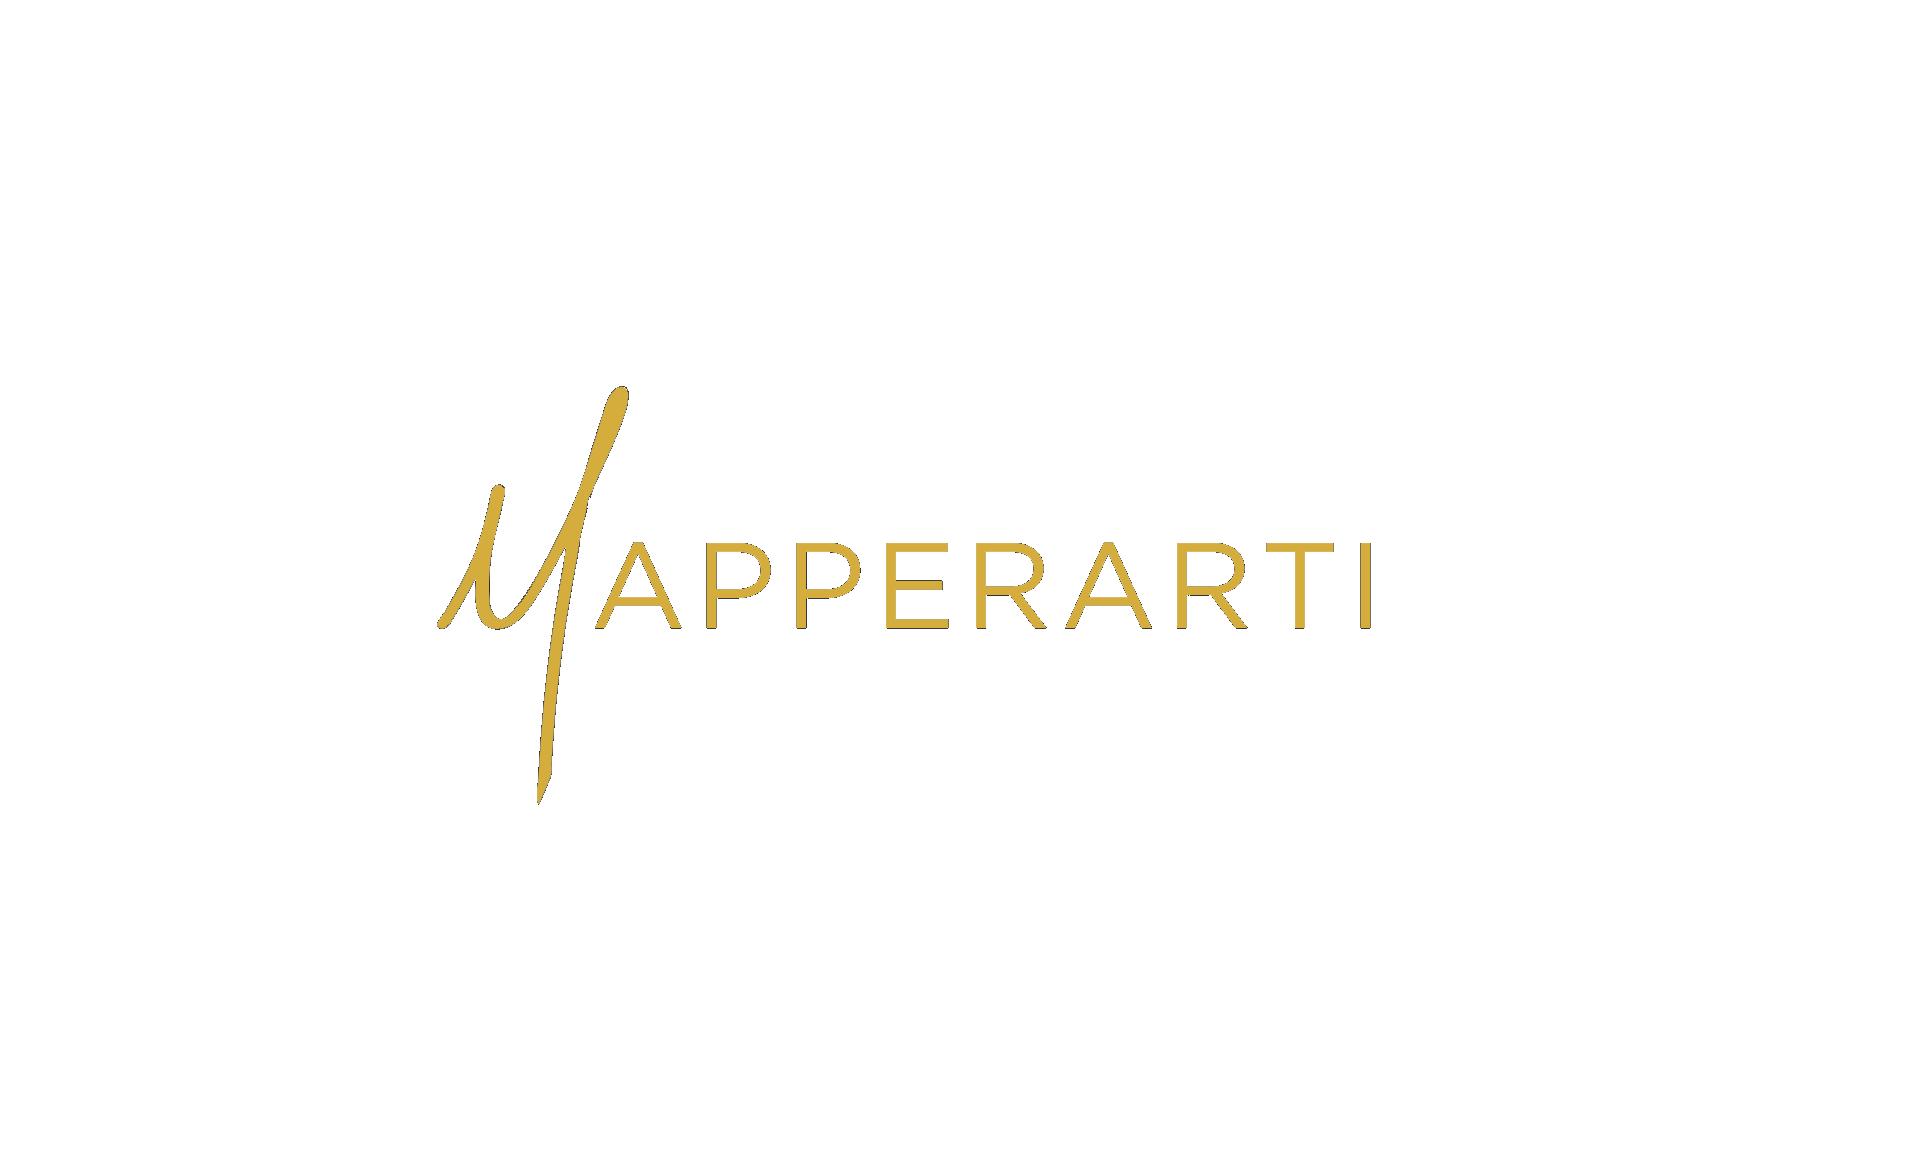 mperati-gold-trans